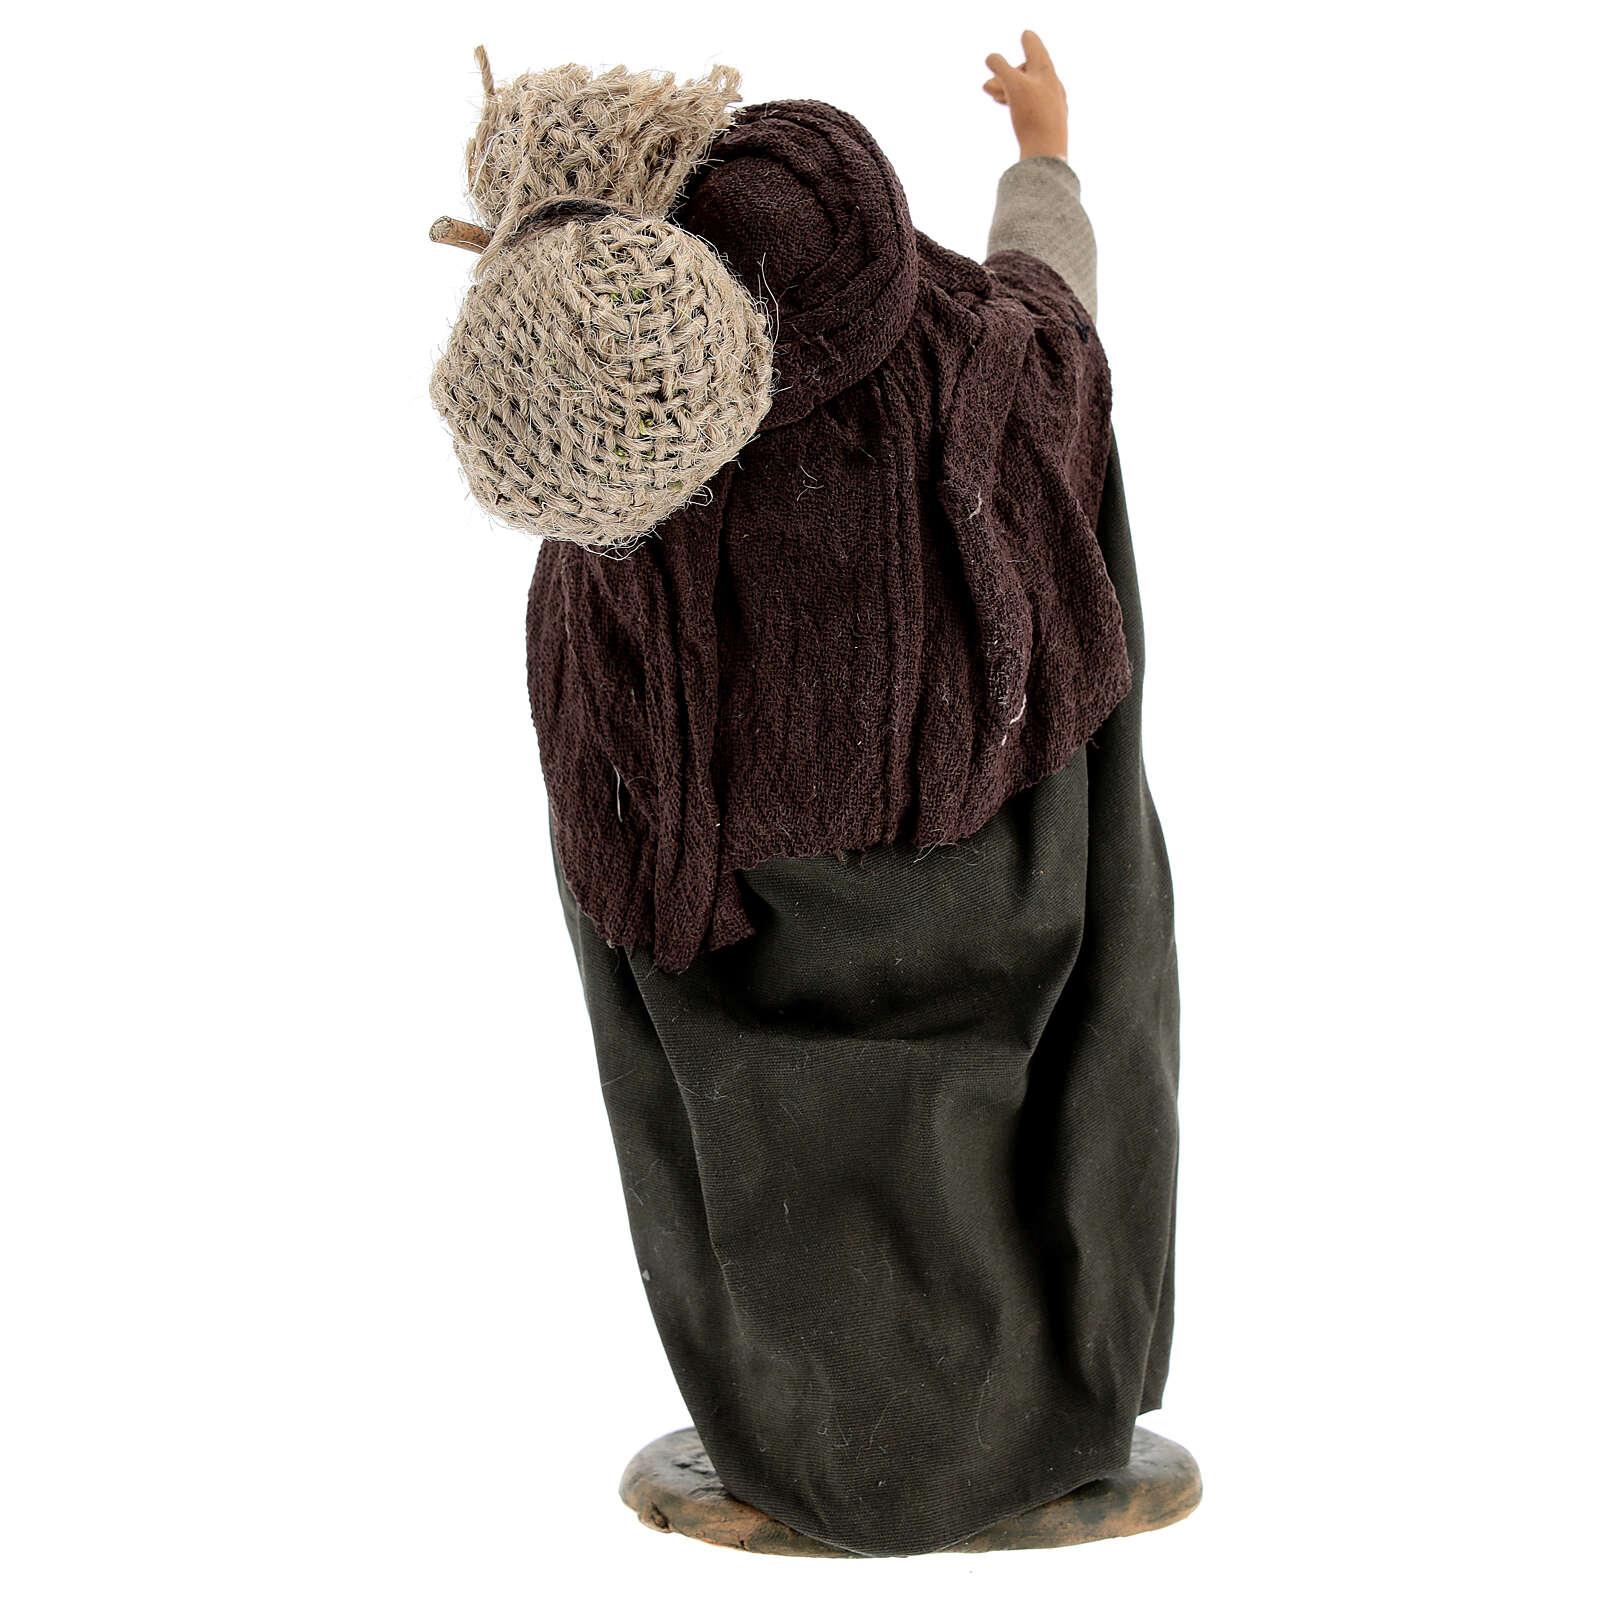 Fanciullo viandante presepe napoletano 30 cm 4